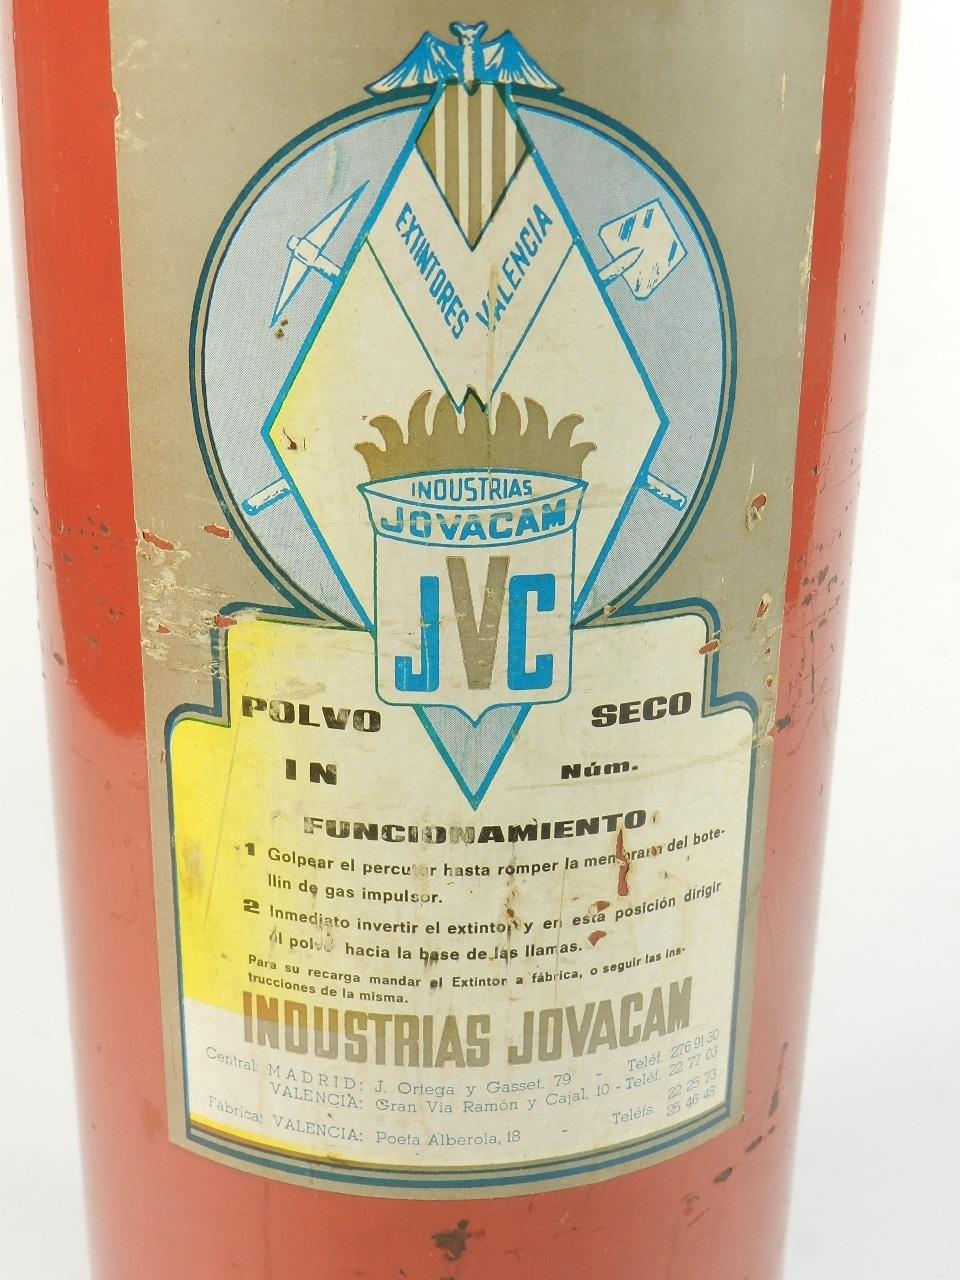 Imagen EXTINTOR JOVACAM AÑO 1974 37286